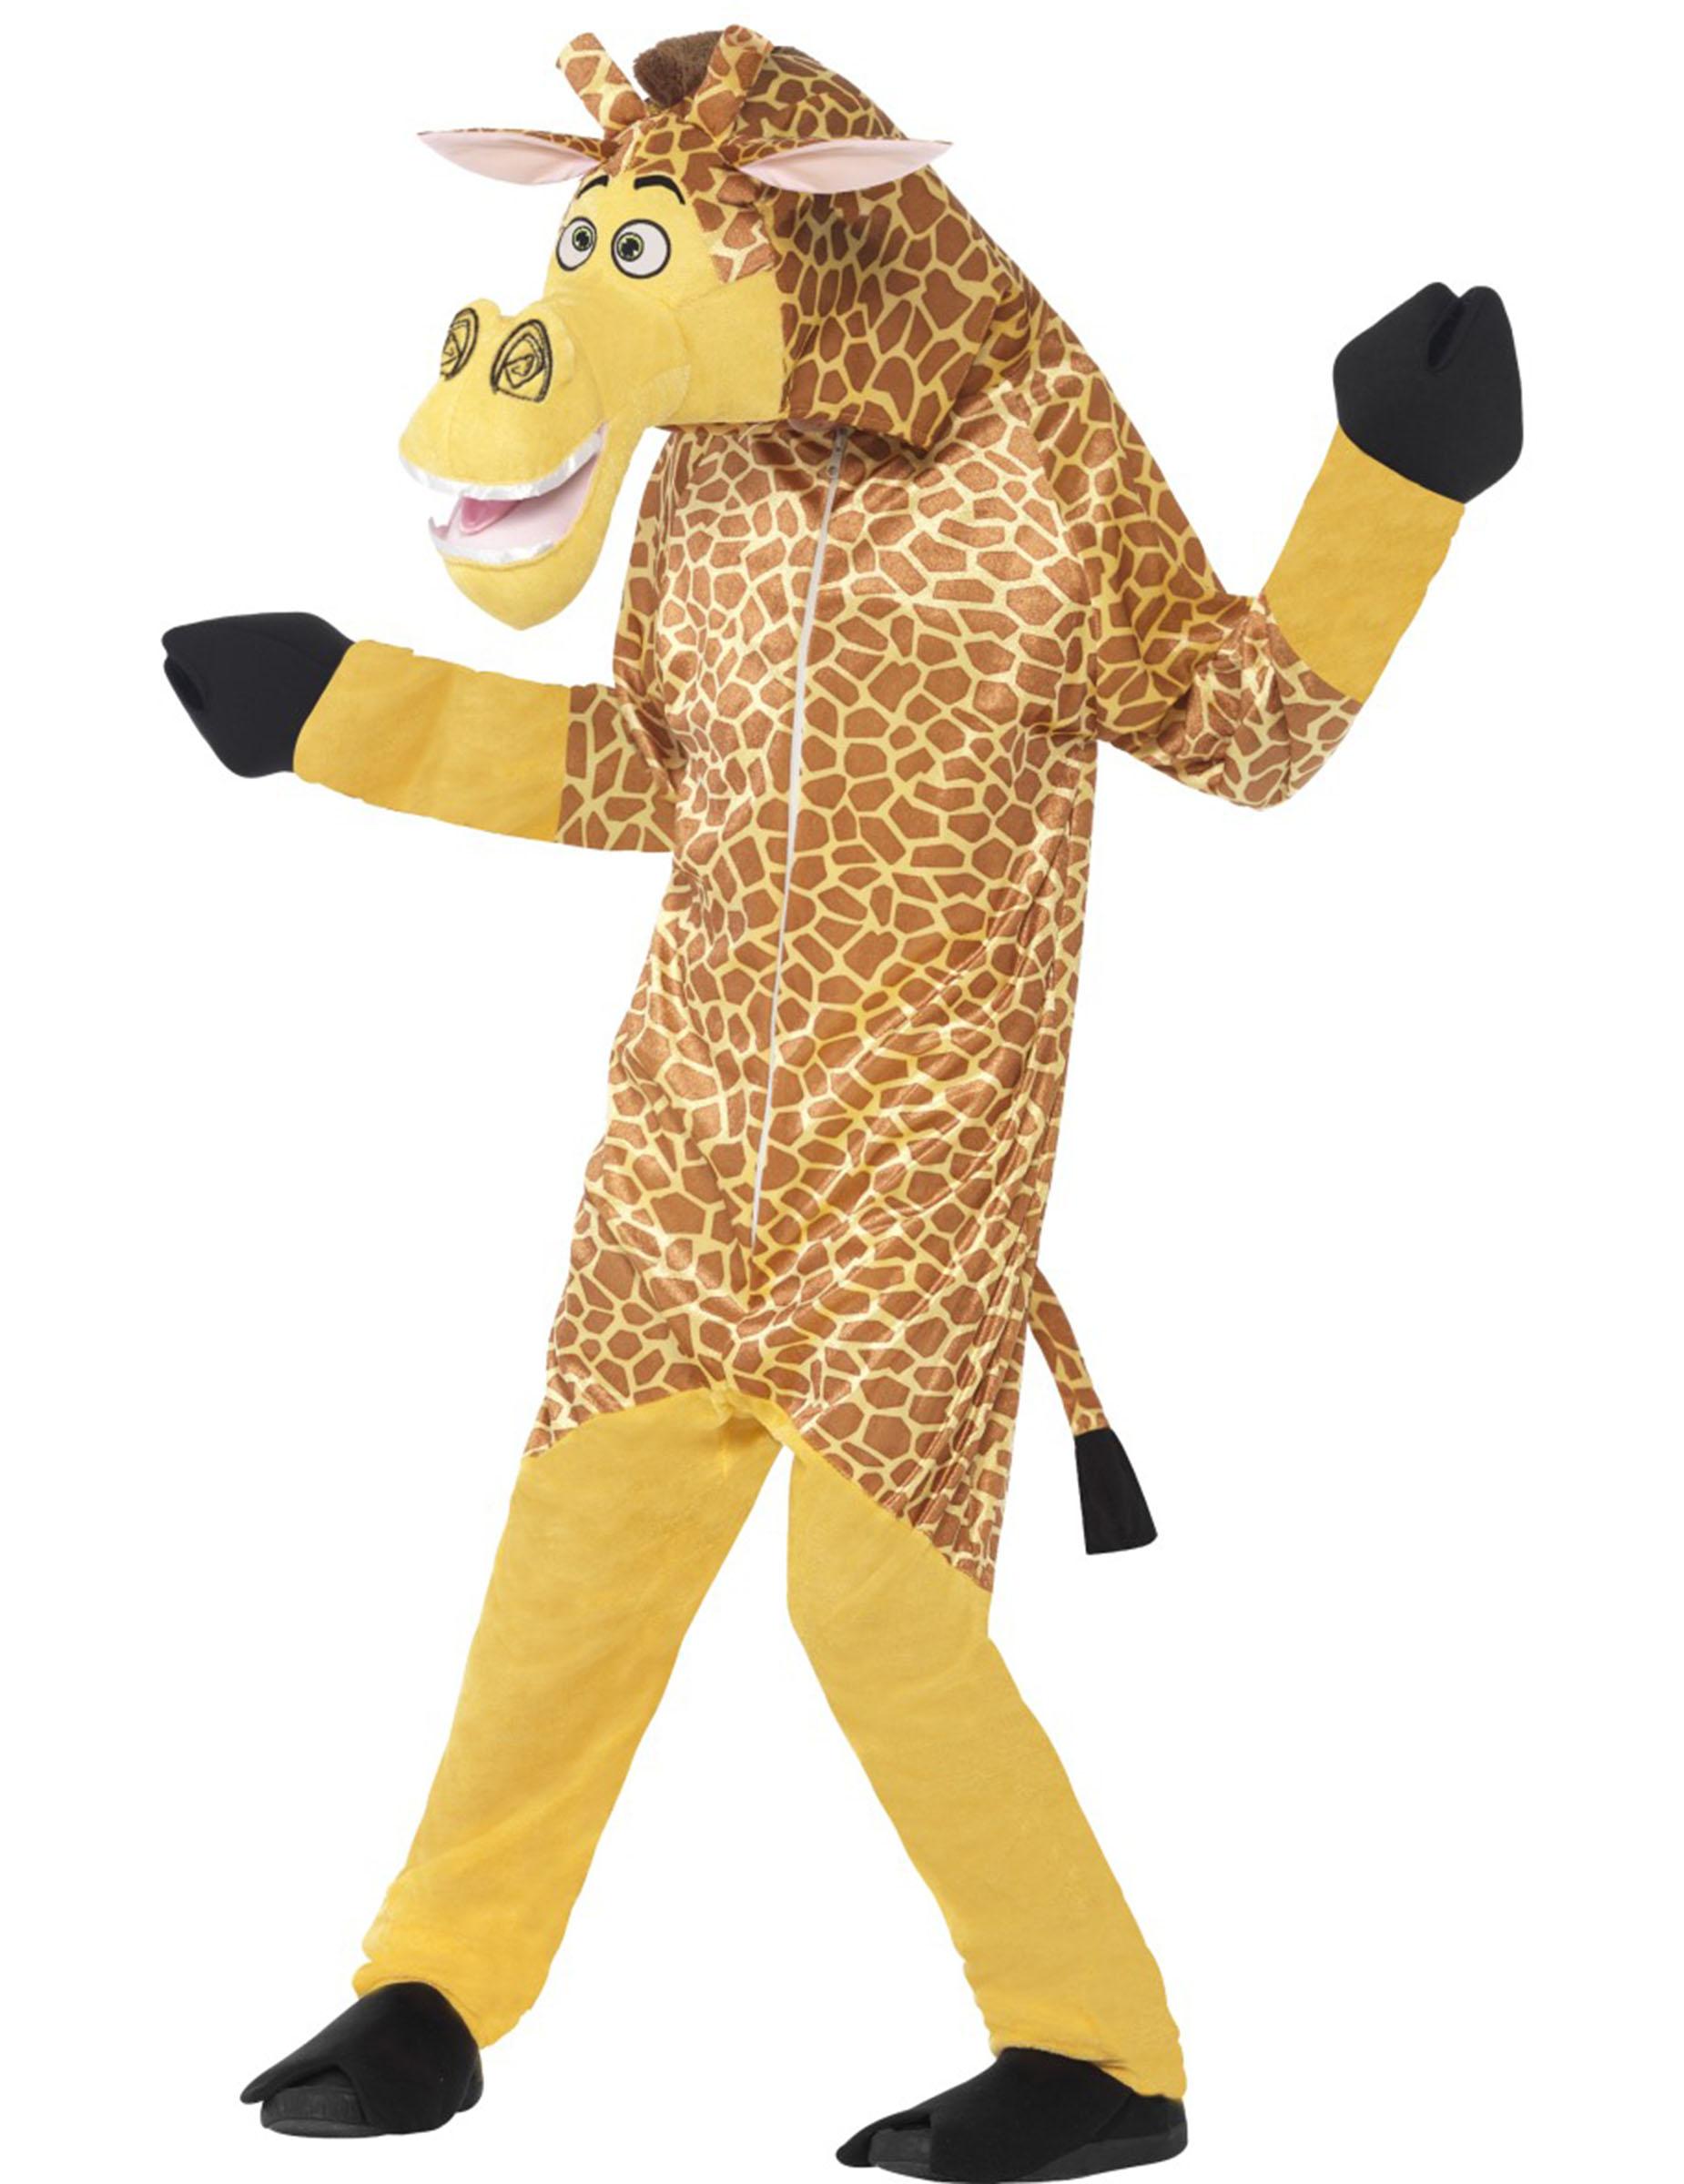 Giraffe Kostüm Kinder : giraffe melman kost m f r kinder aus madagascar ~ Frokenaadalensverden.com Haus und Dekorationen